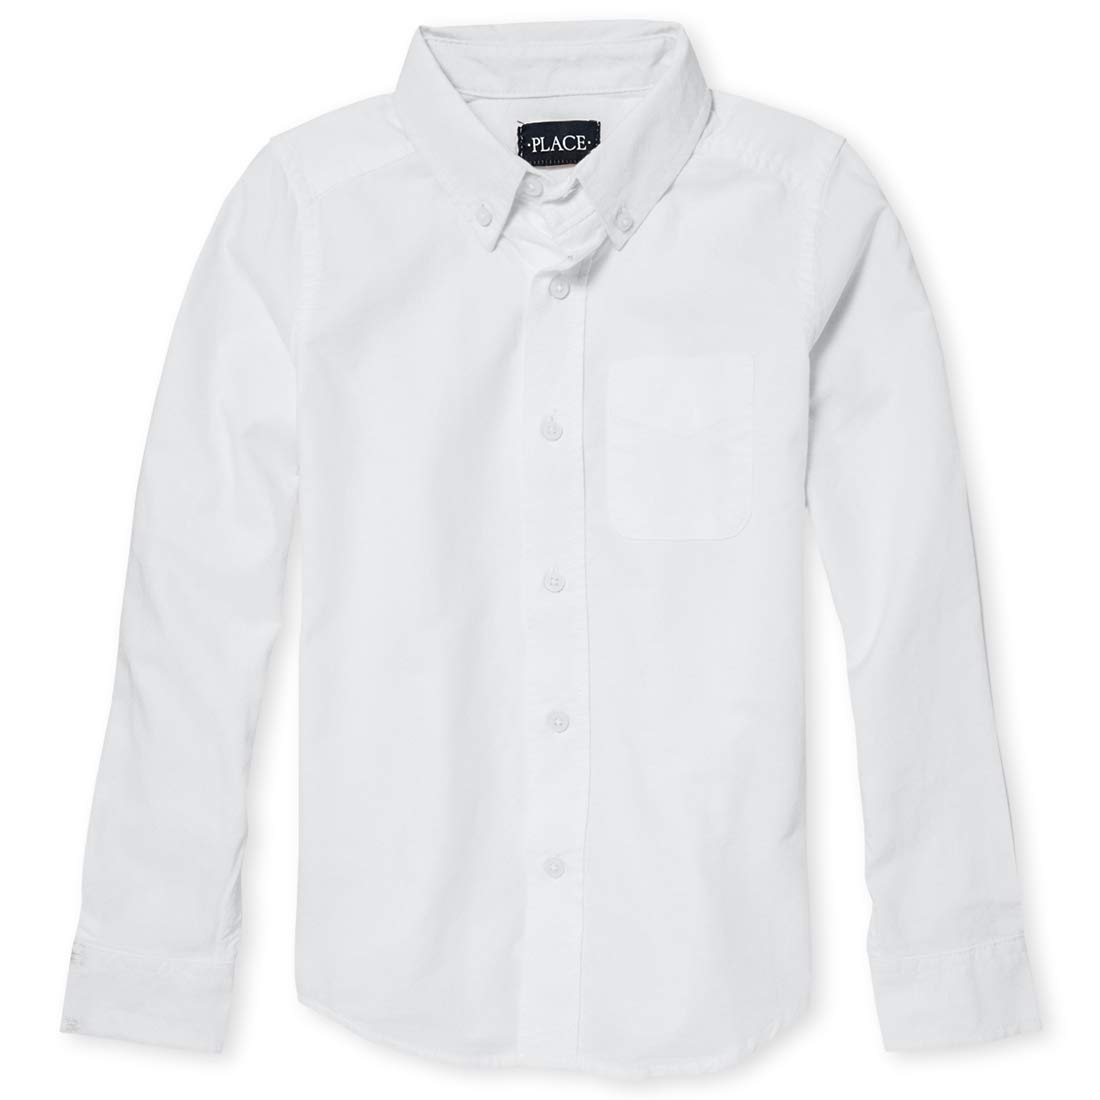 The Children's Place Big Boys' Long Sleeve Uniform Oxford Shirt, White 5063, XXL(16)